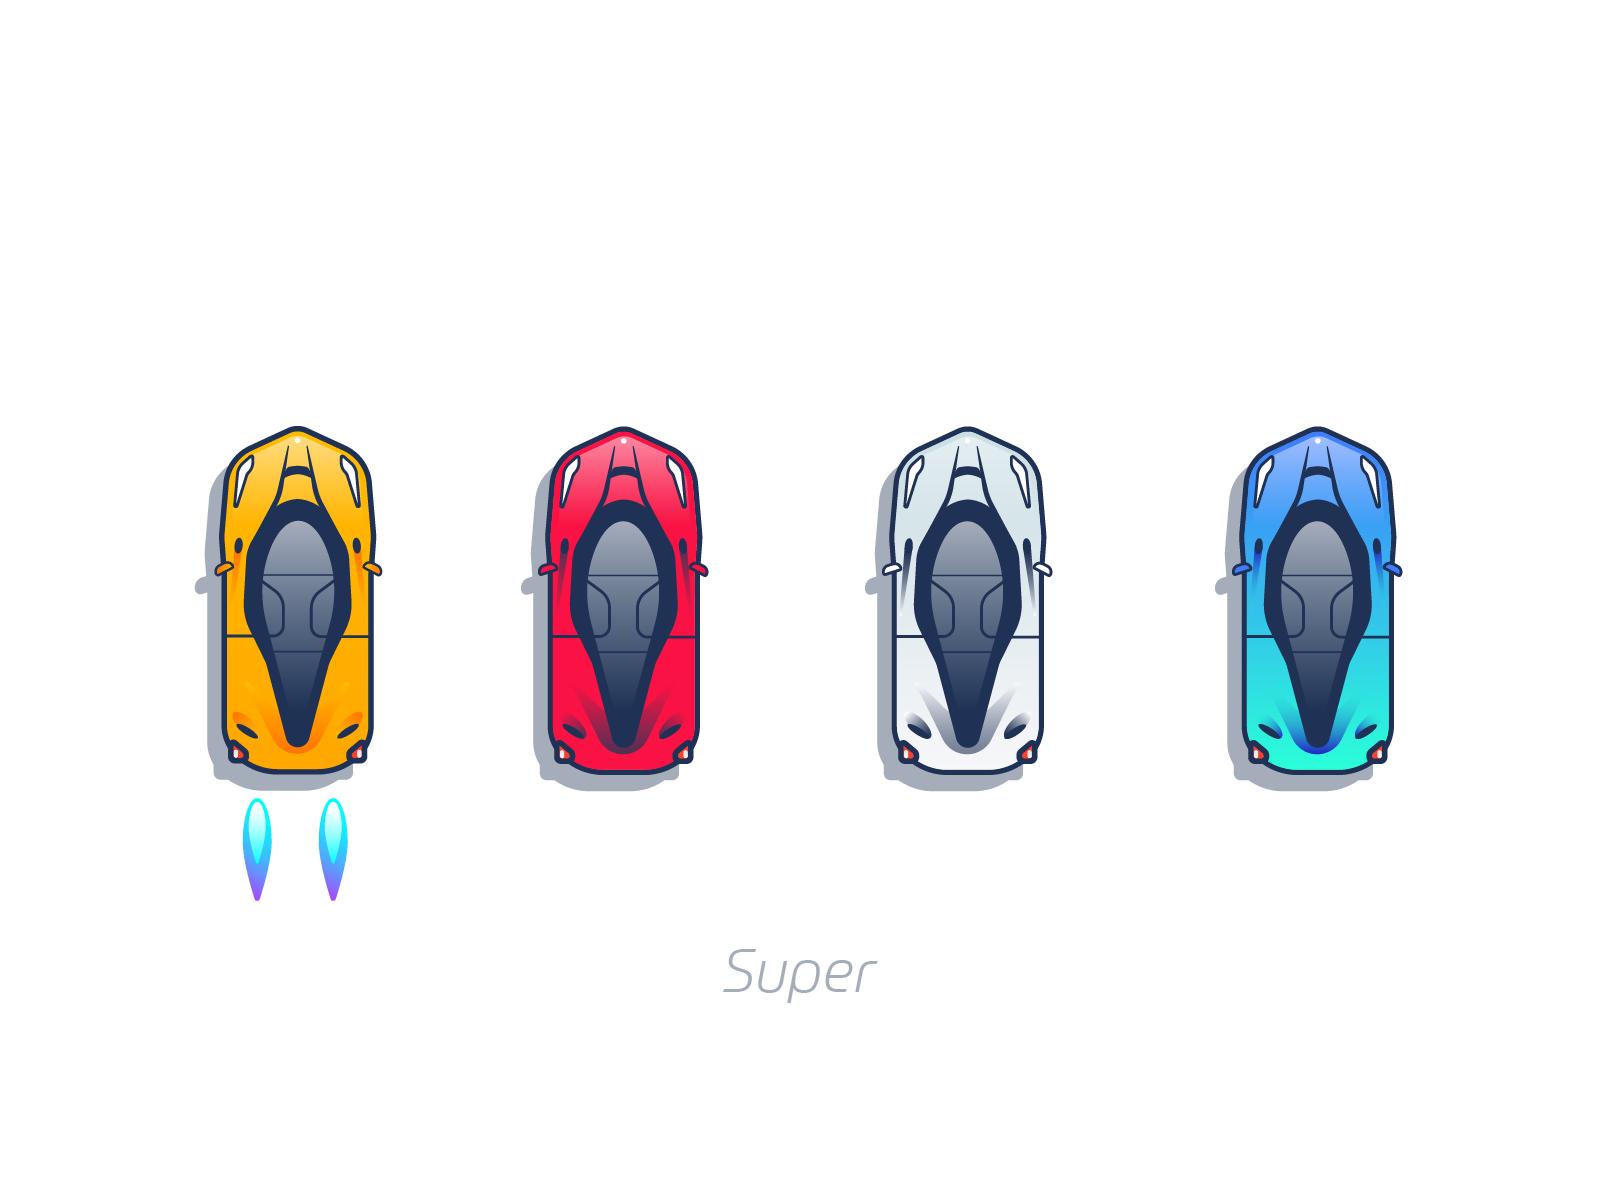 Super cars mobile game design